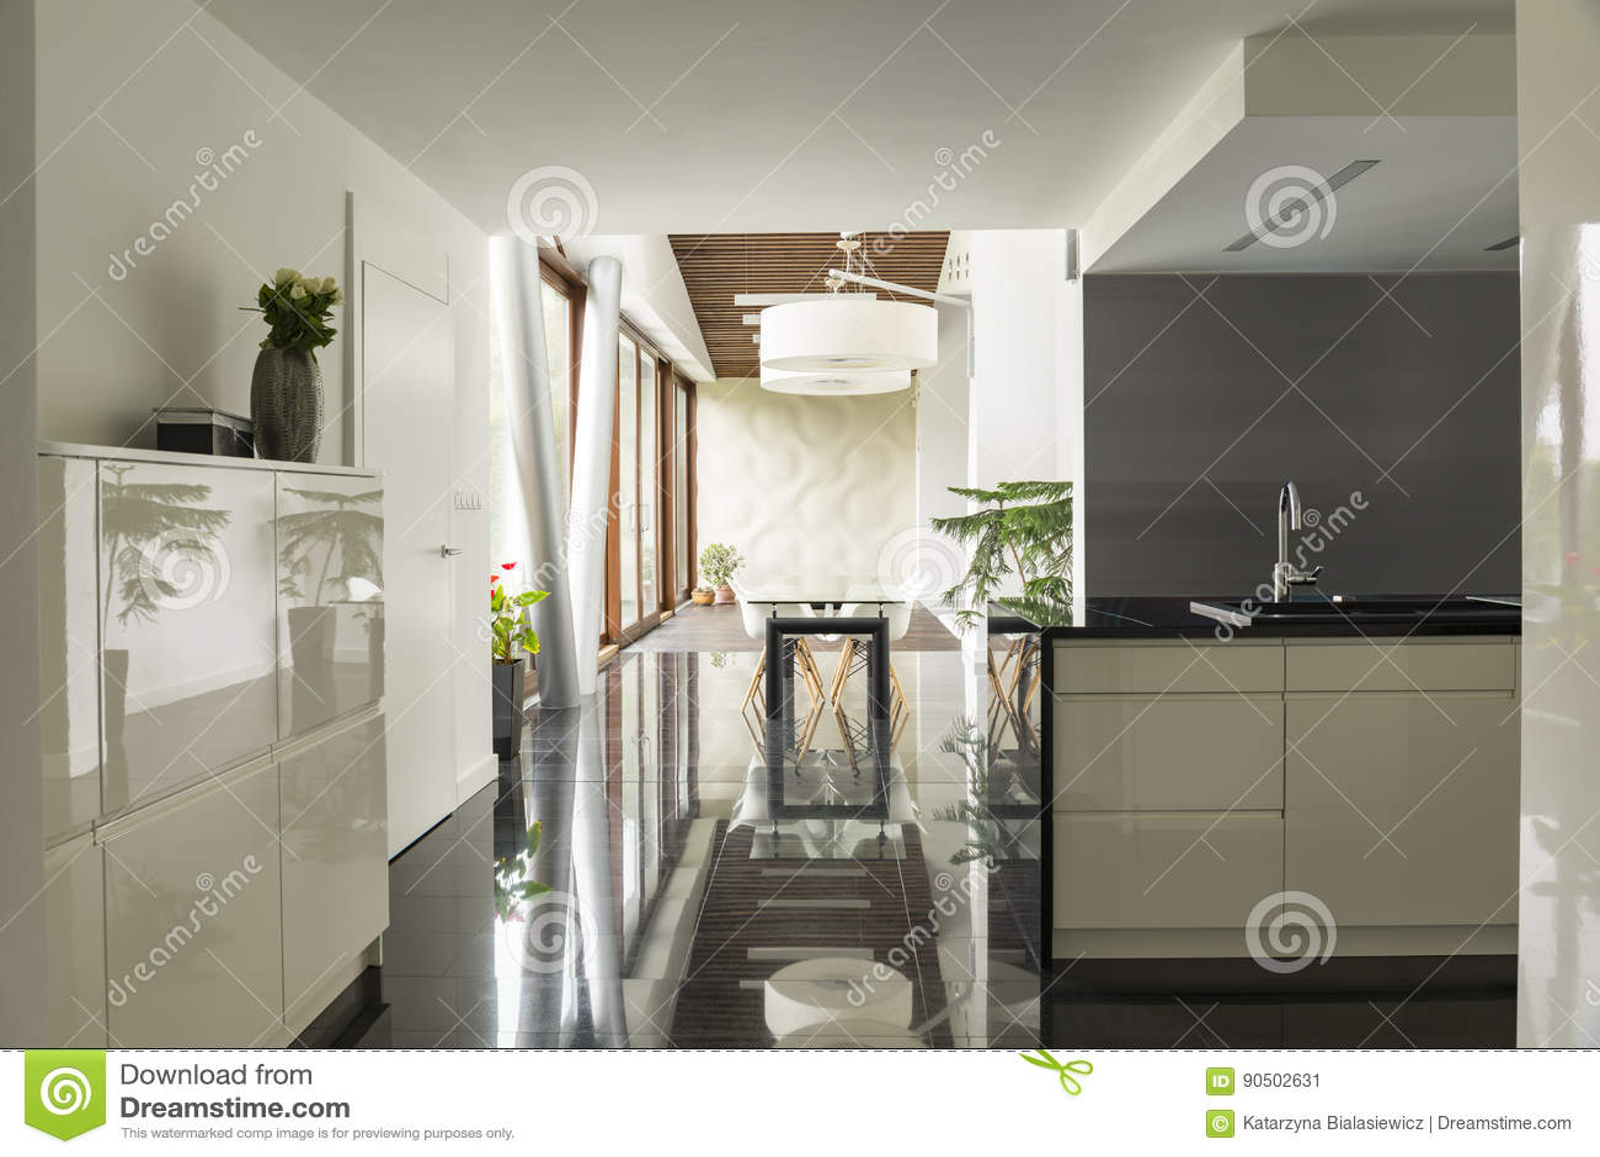 Cucina Con Sala Da Pranzo   Sala Da Pranzo E Cucina Moderne Immagine ...